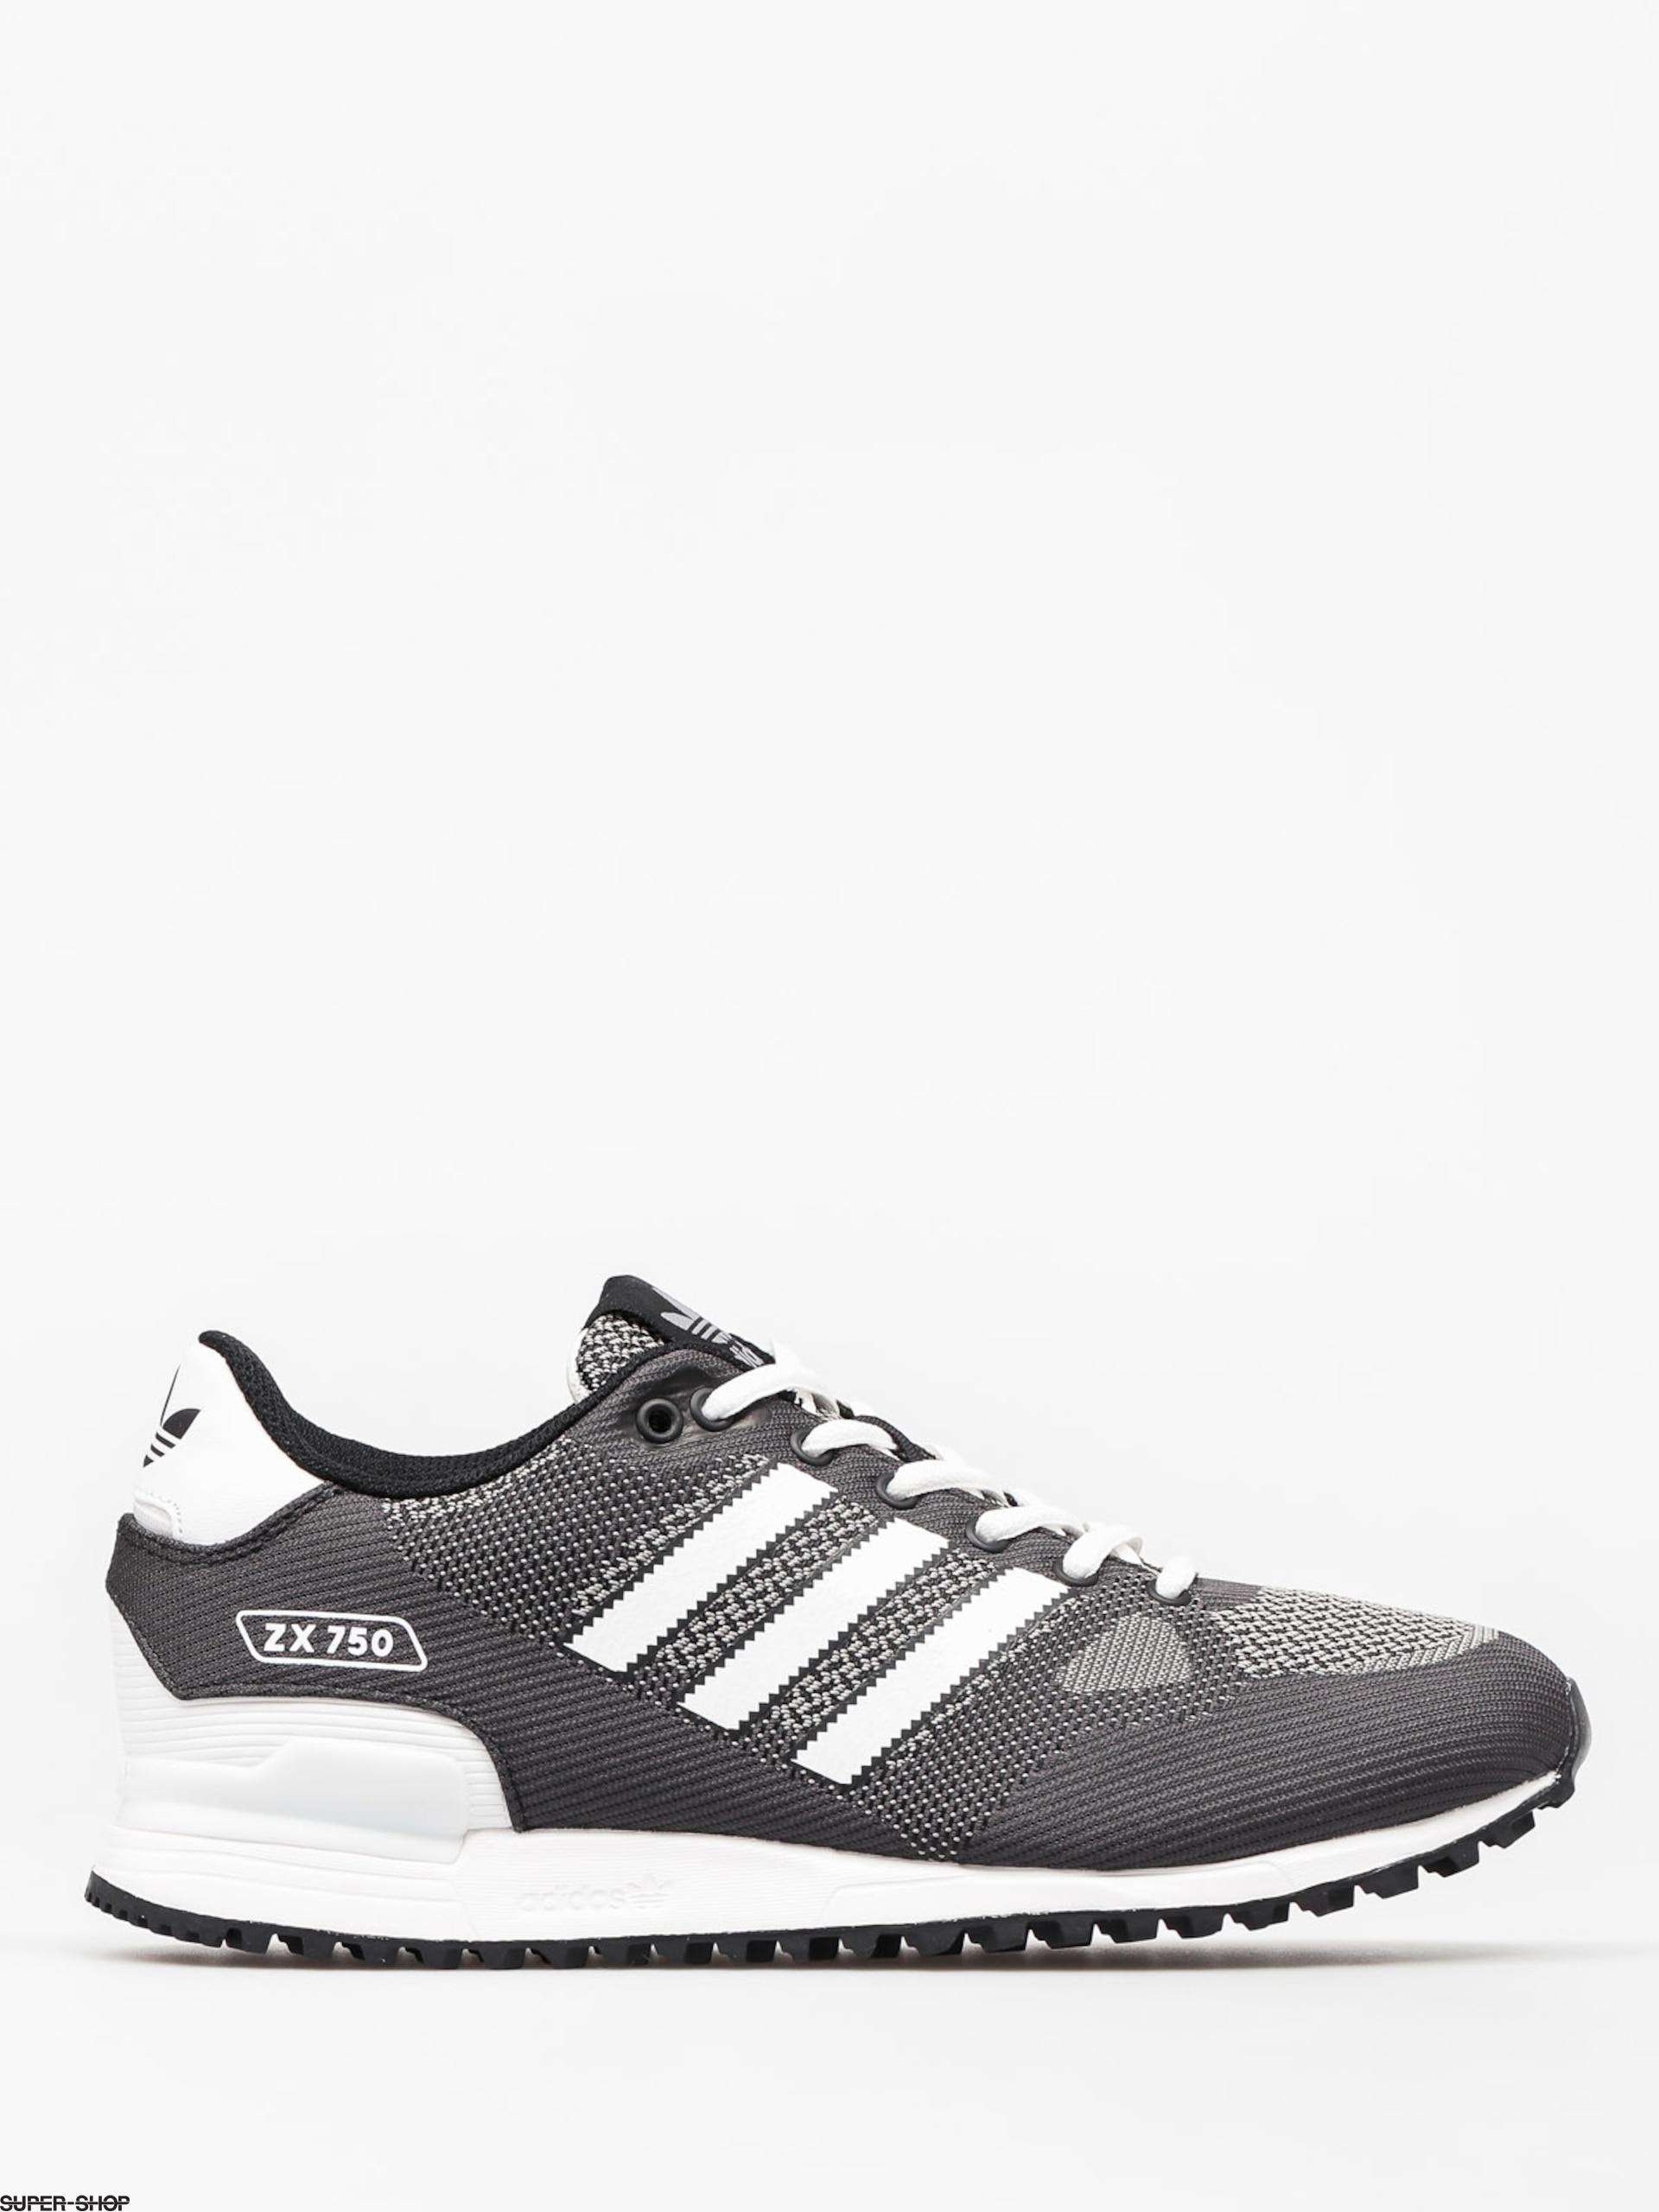 separation shoes 4f865 241ee adidas Shoes Zx 750 Wv (cblack/ftwwht/utiblk)